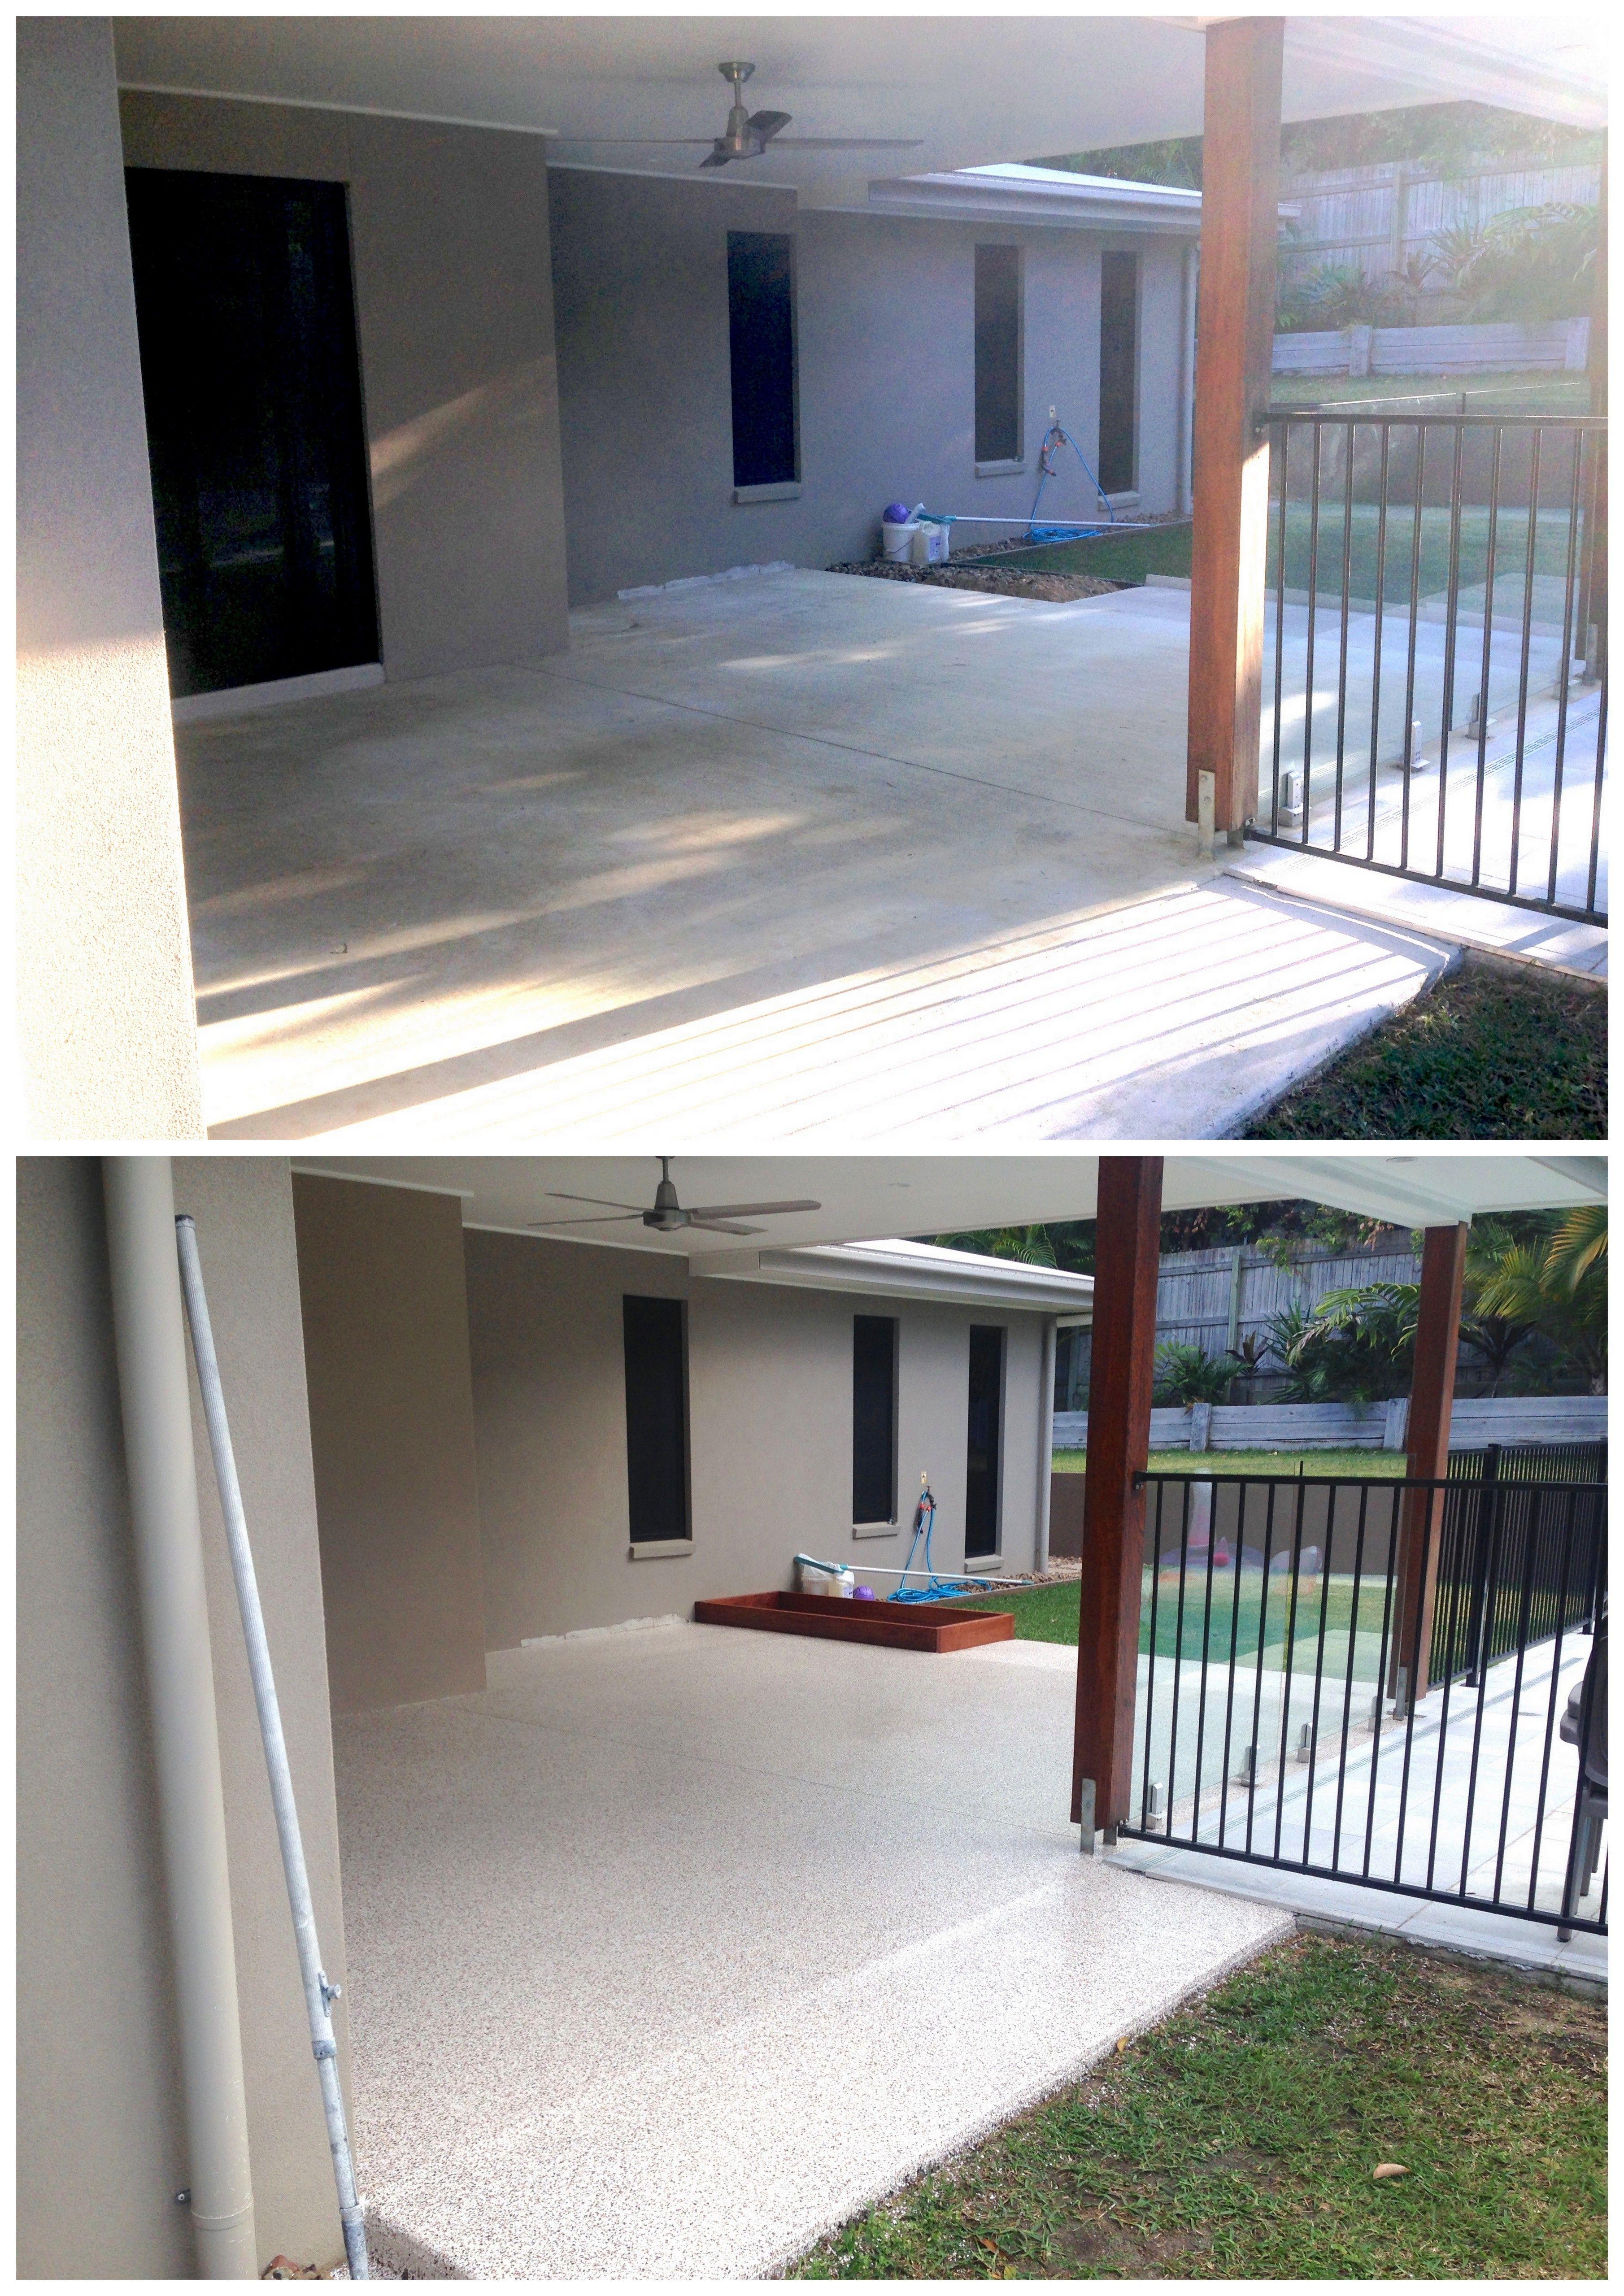 Noosa Epoxy Flooring by The Garage Floor Co. Premium epoxy